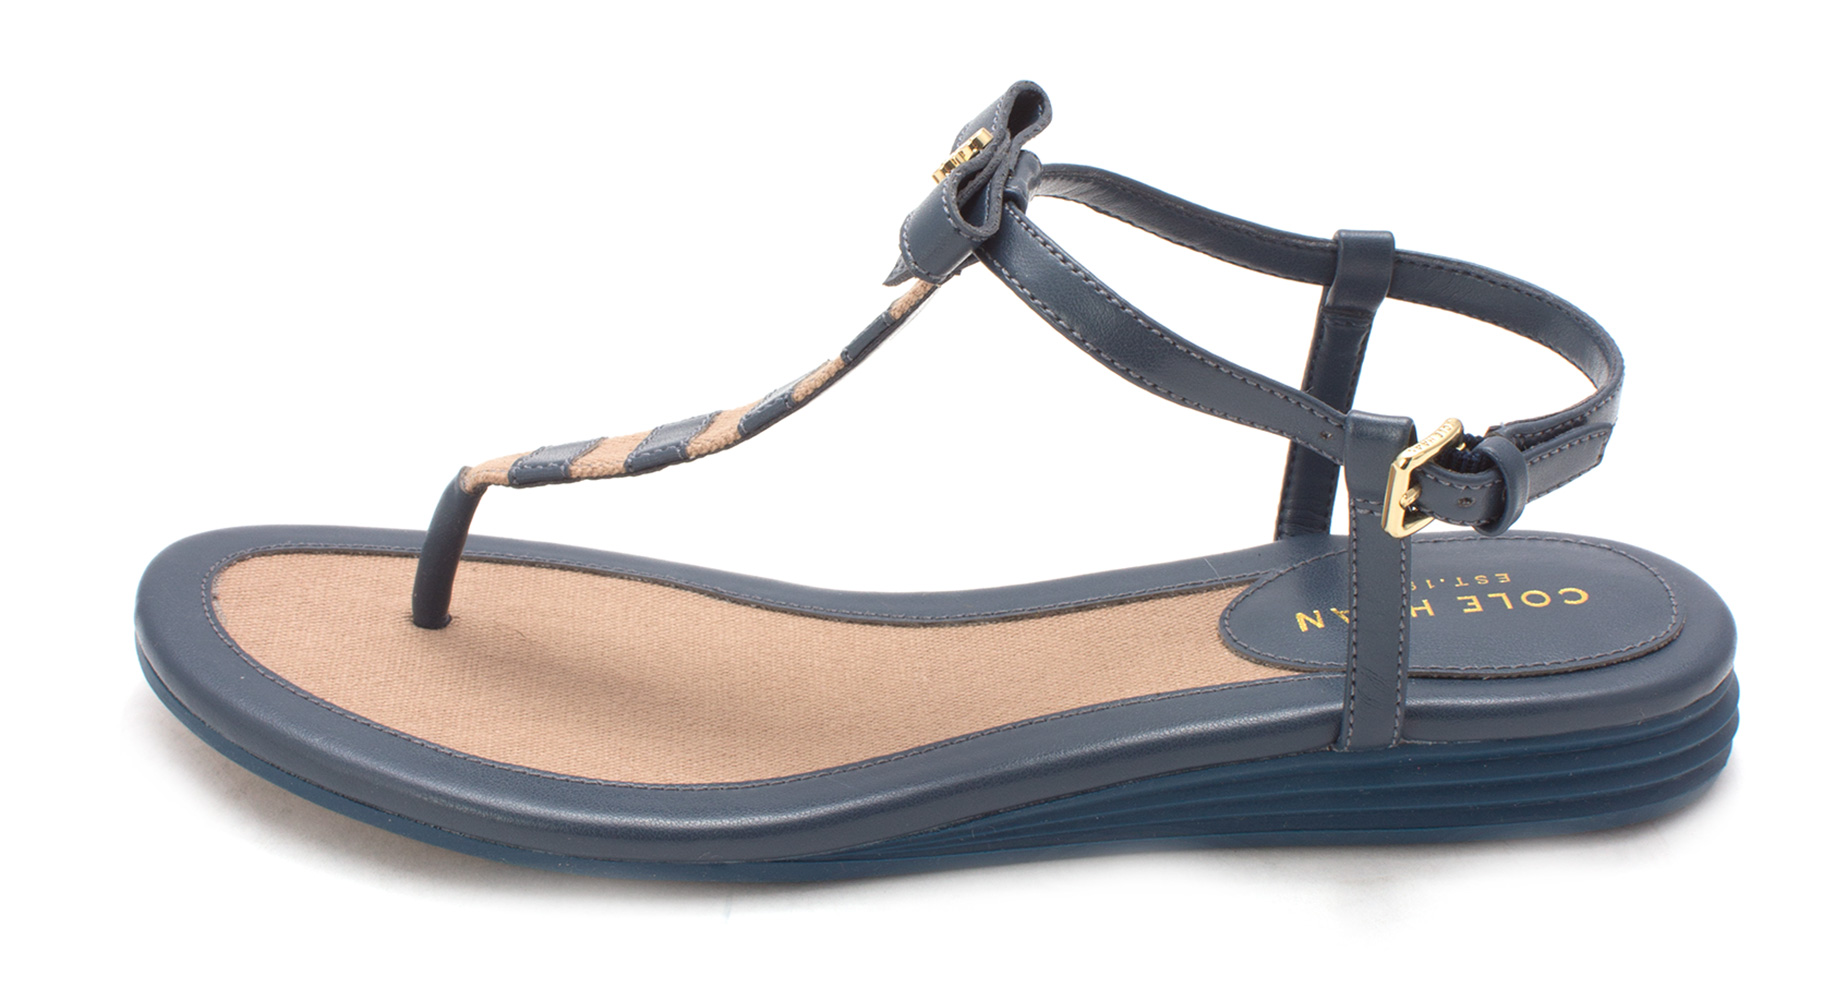 Cole Haan Womens Kathesam Open Toe Casual TStrap Sandals BlueTan Size 60